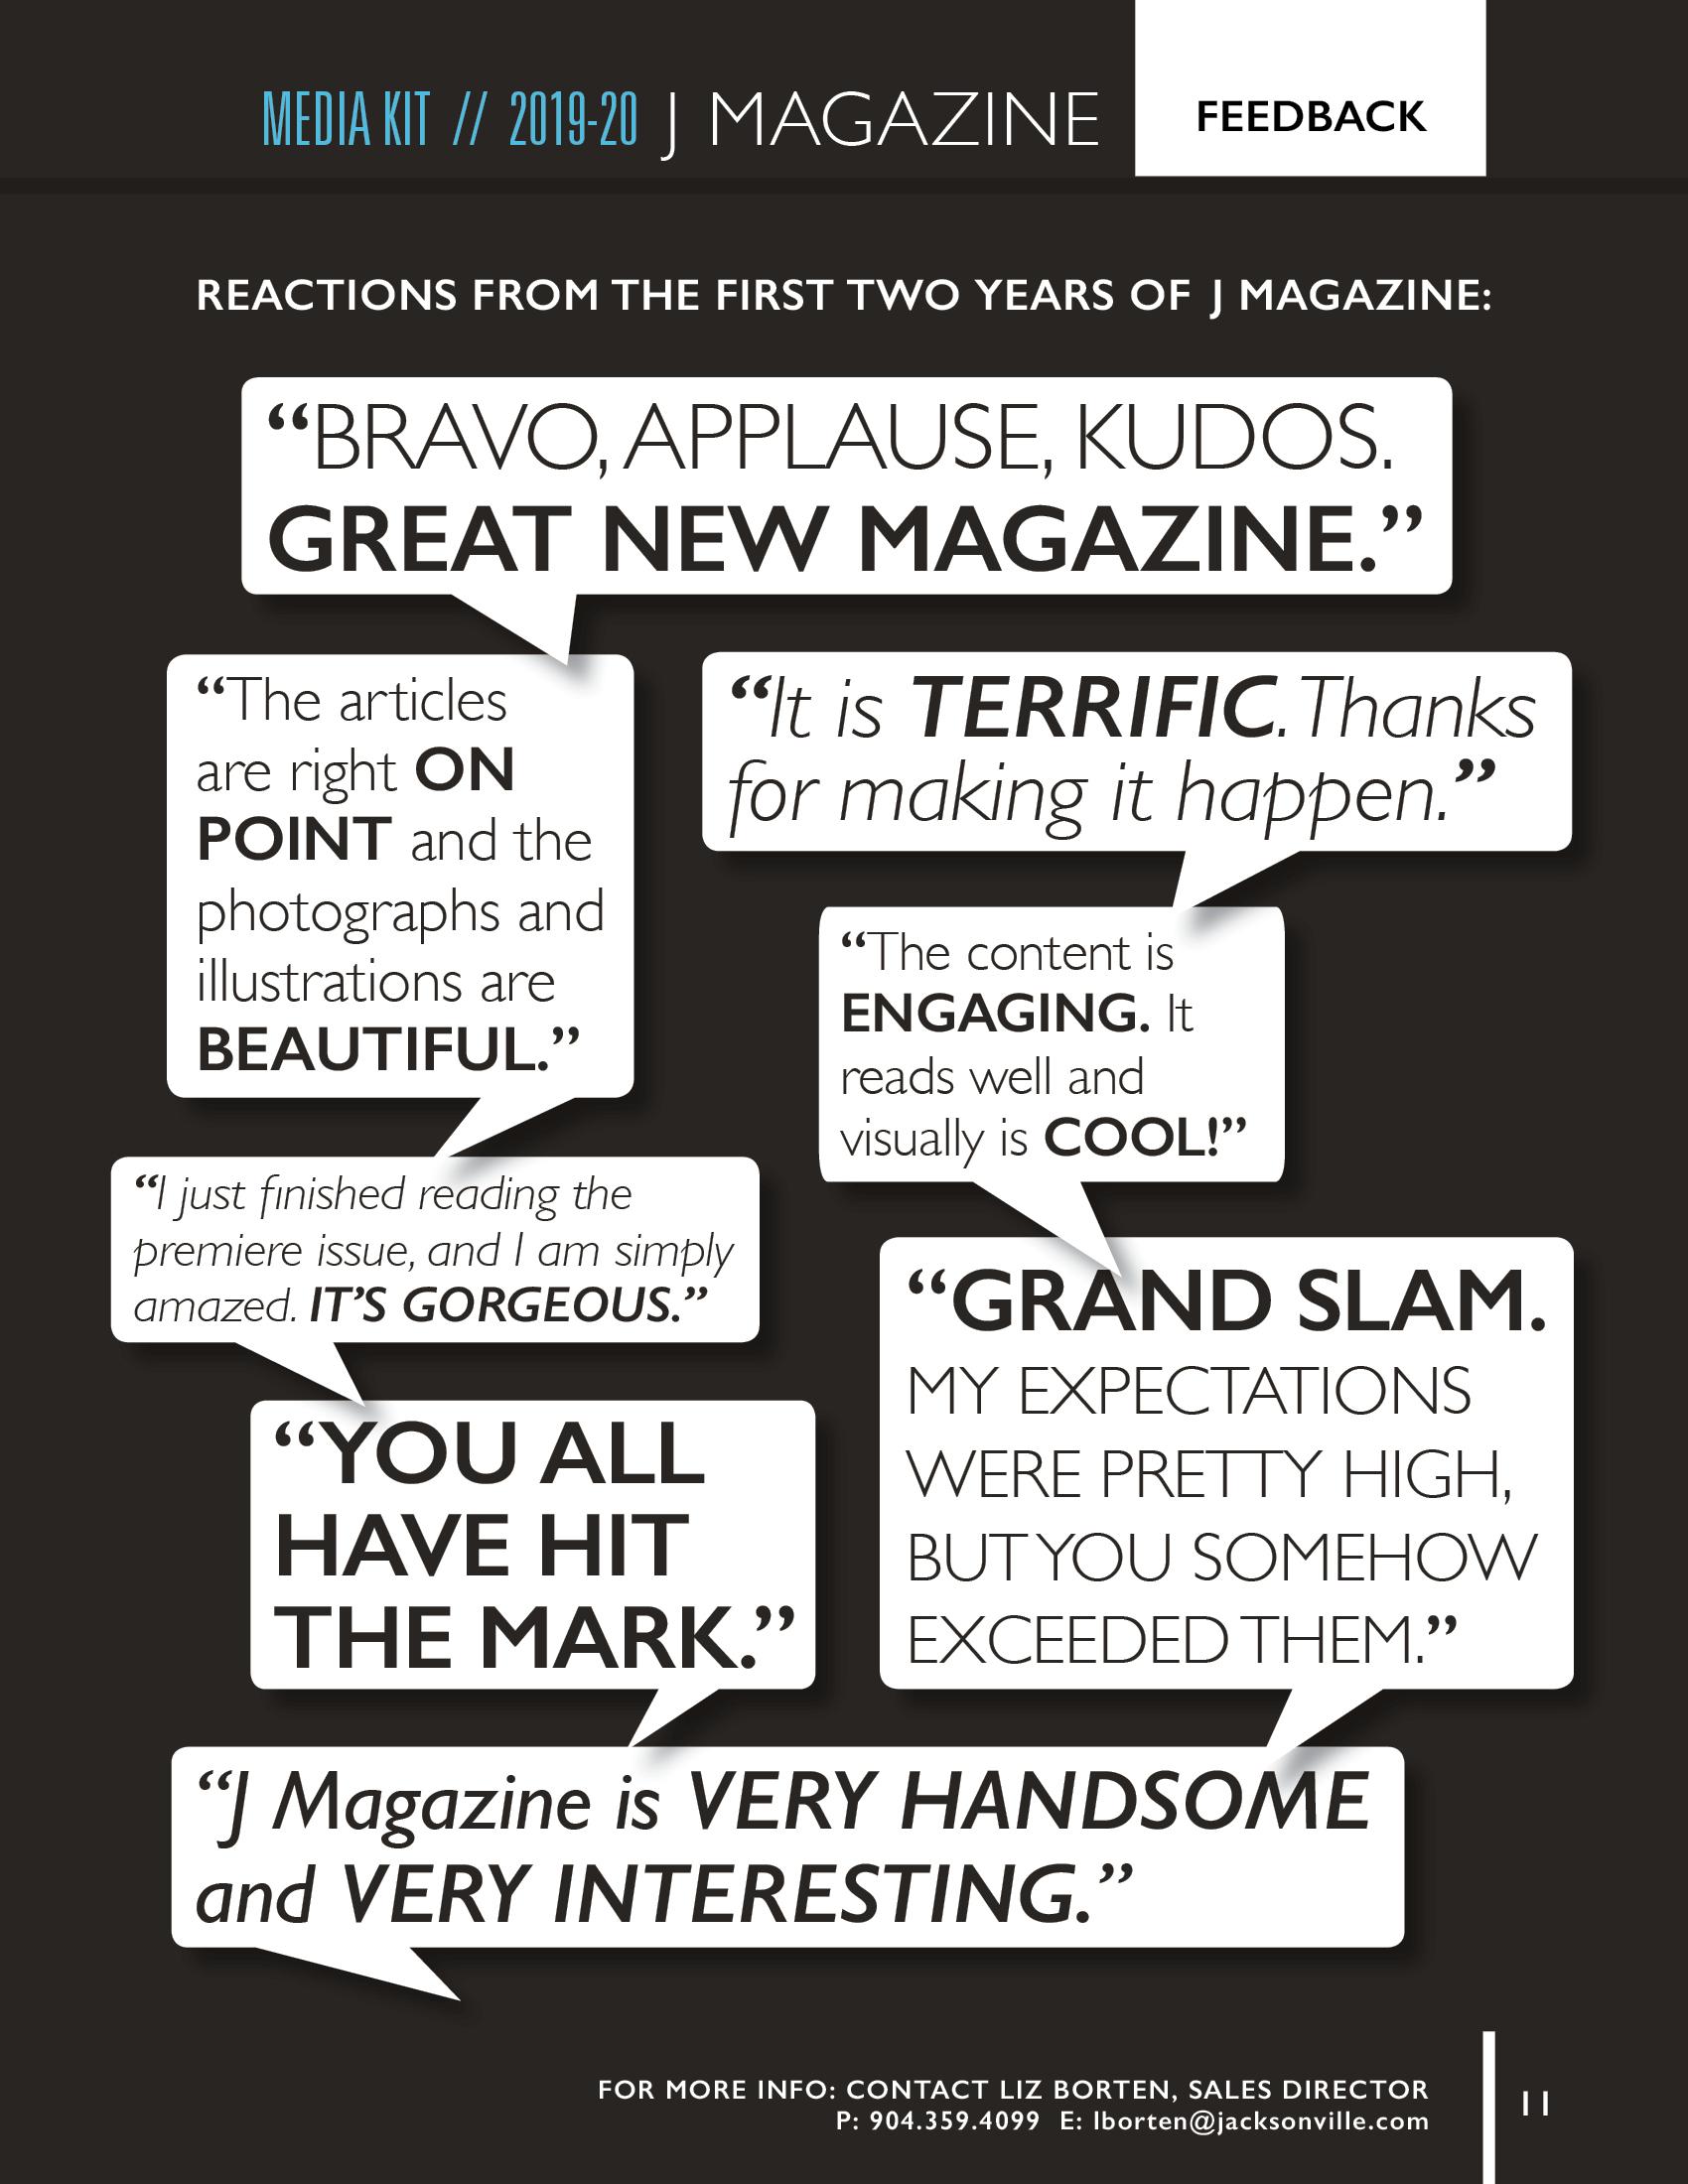 J Mag Media Kit..v2SM11.jpg